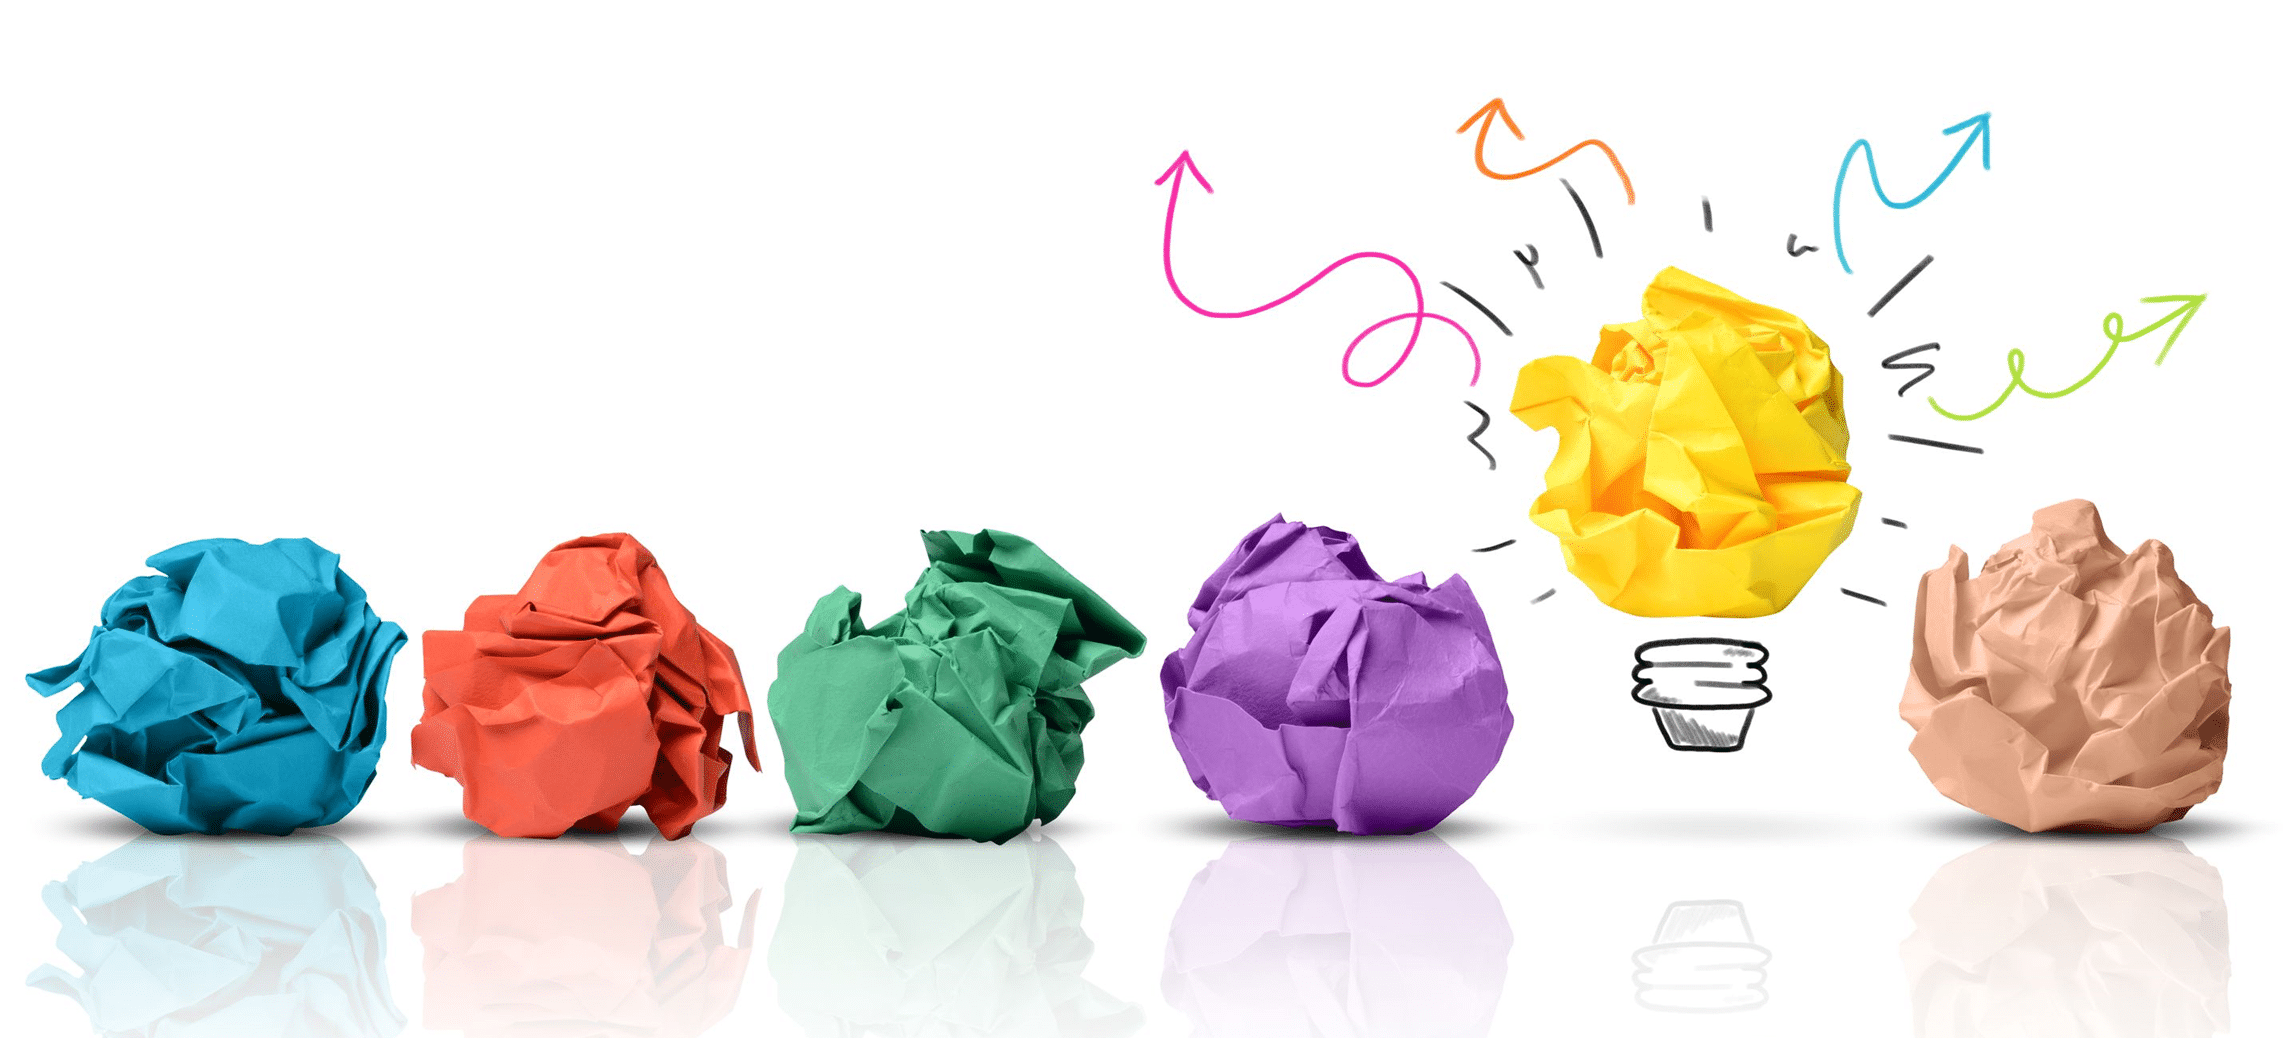 Strategie di Design Thinking - Brainstorming e Design Thinking - Web Agency Ragusa & SEO Ragusa